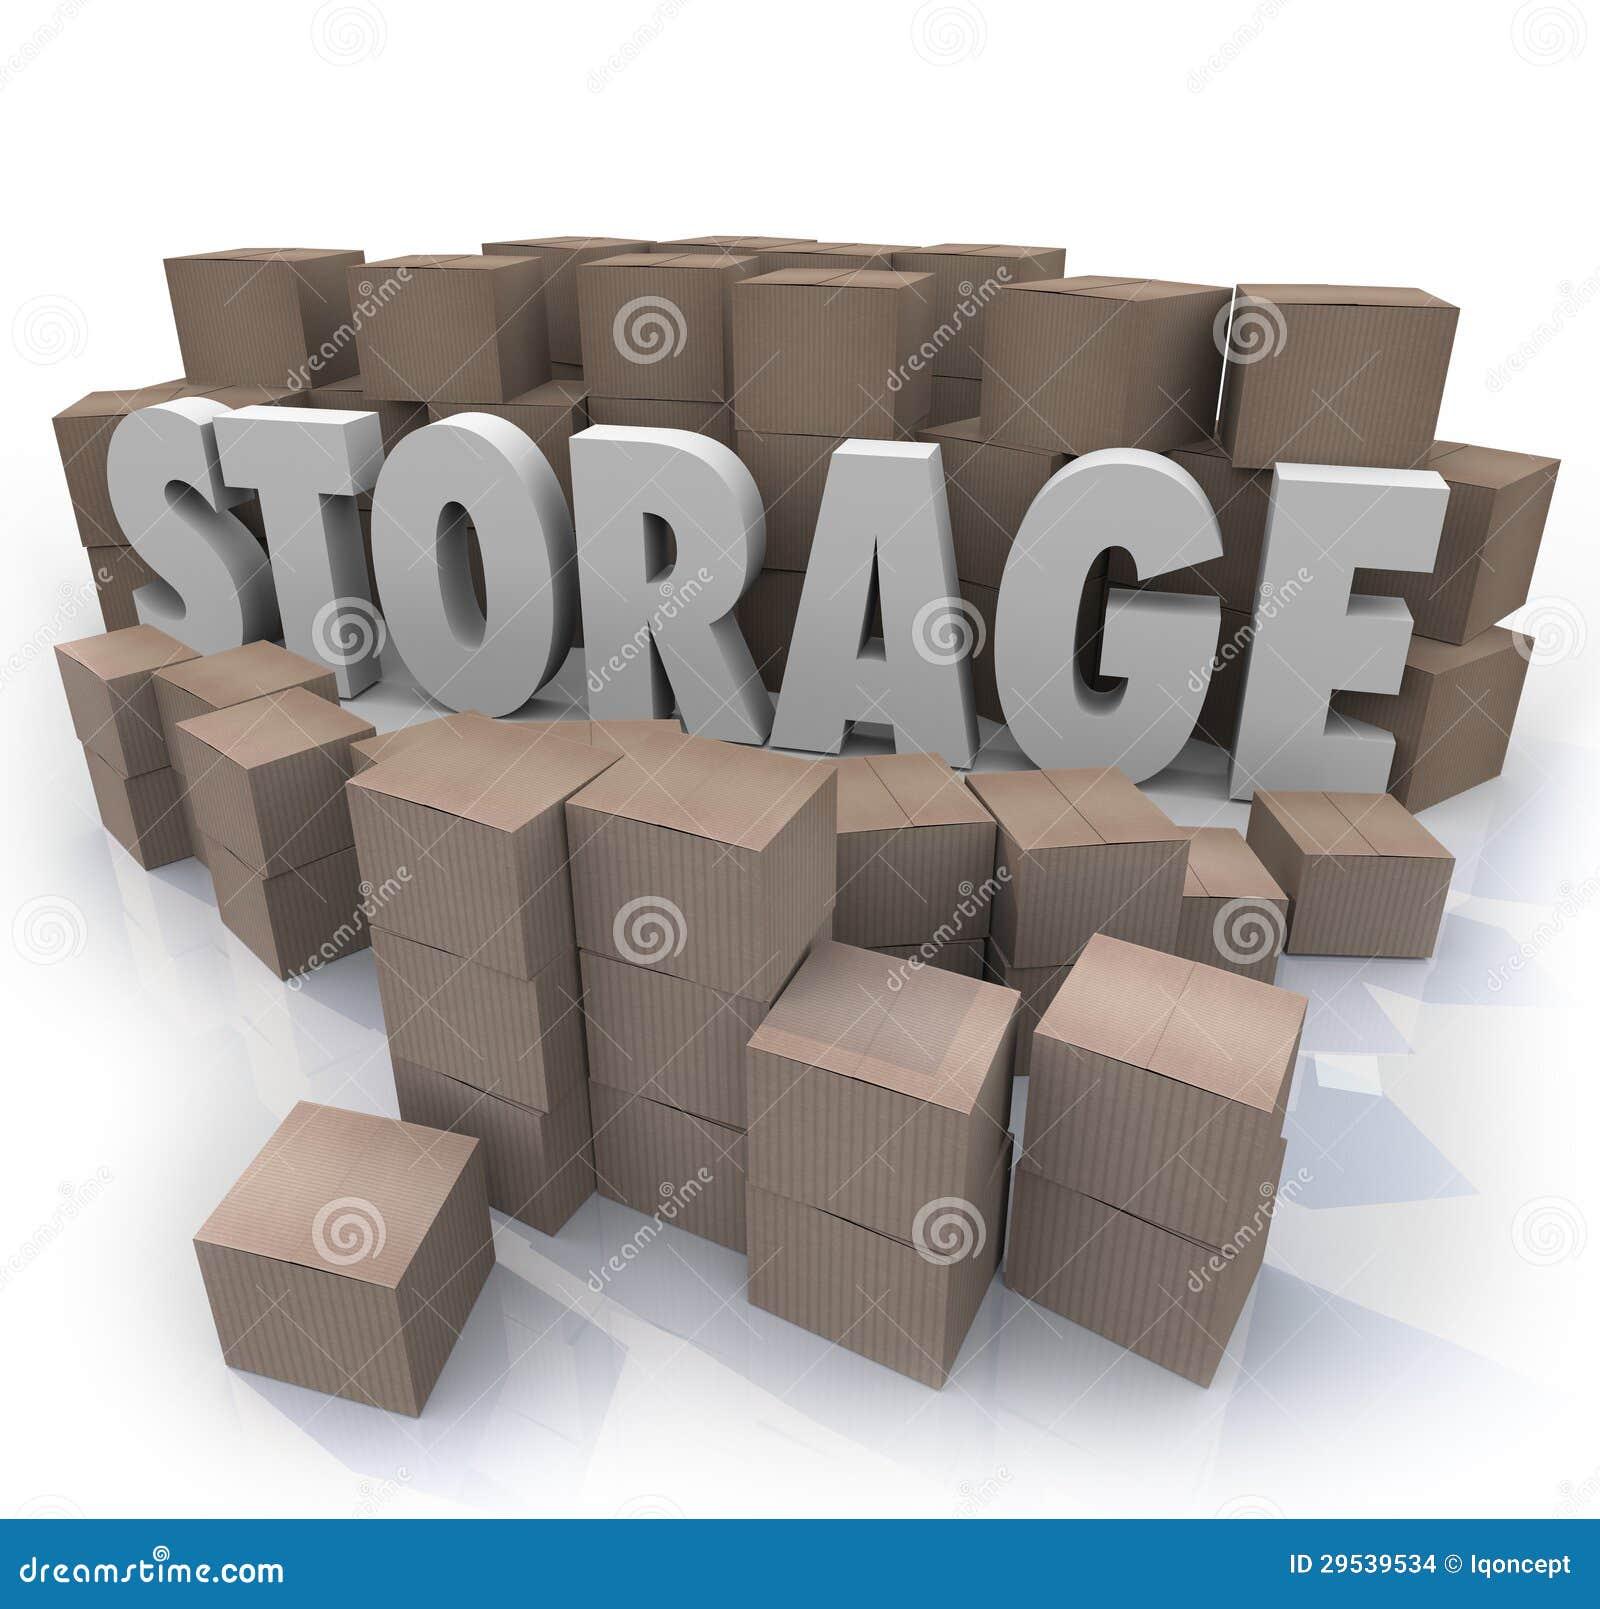 Storage Word Piles Cardboard Boxes Basement Locker Stock